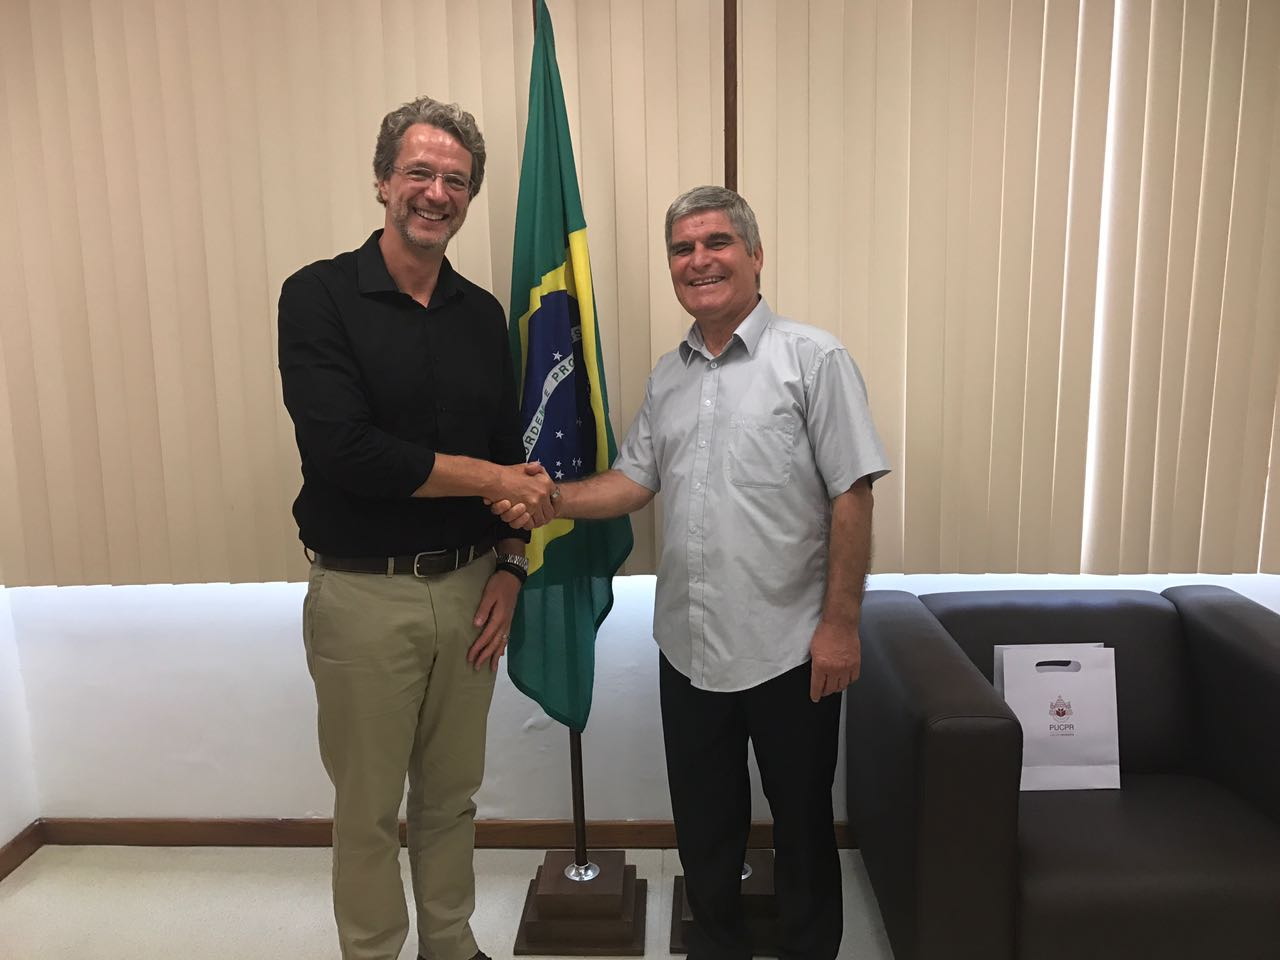 prof. Radev, VUM's president visiting universities in Brazil